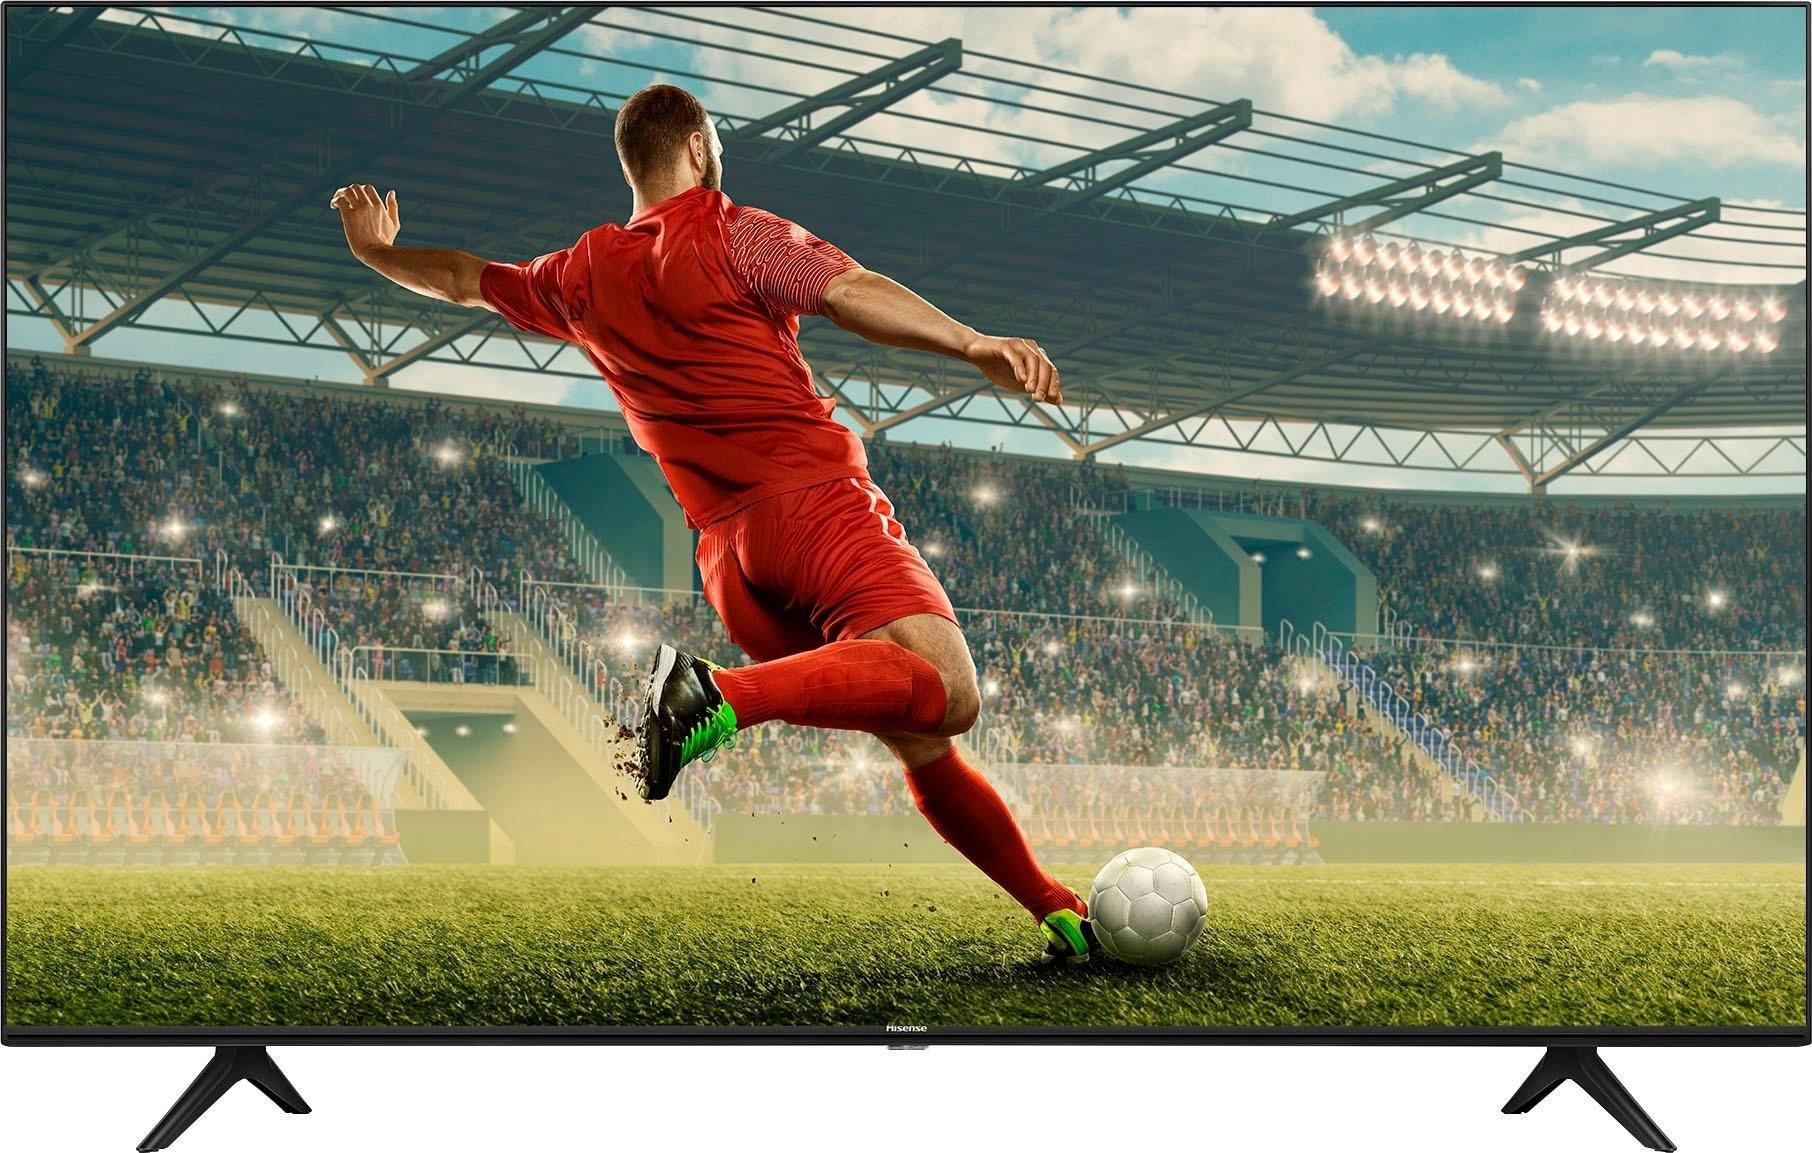 Hisense led-tv 65AE7010F nu online kopen bij OTTO